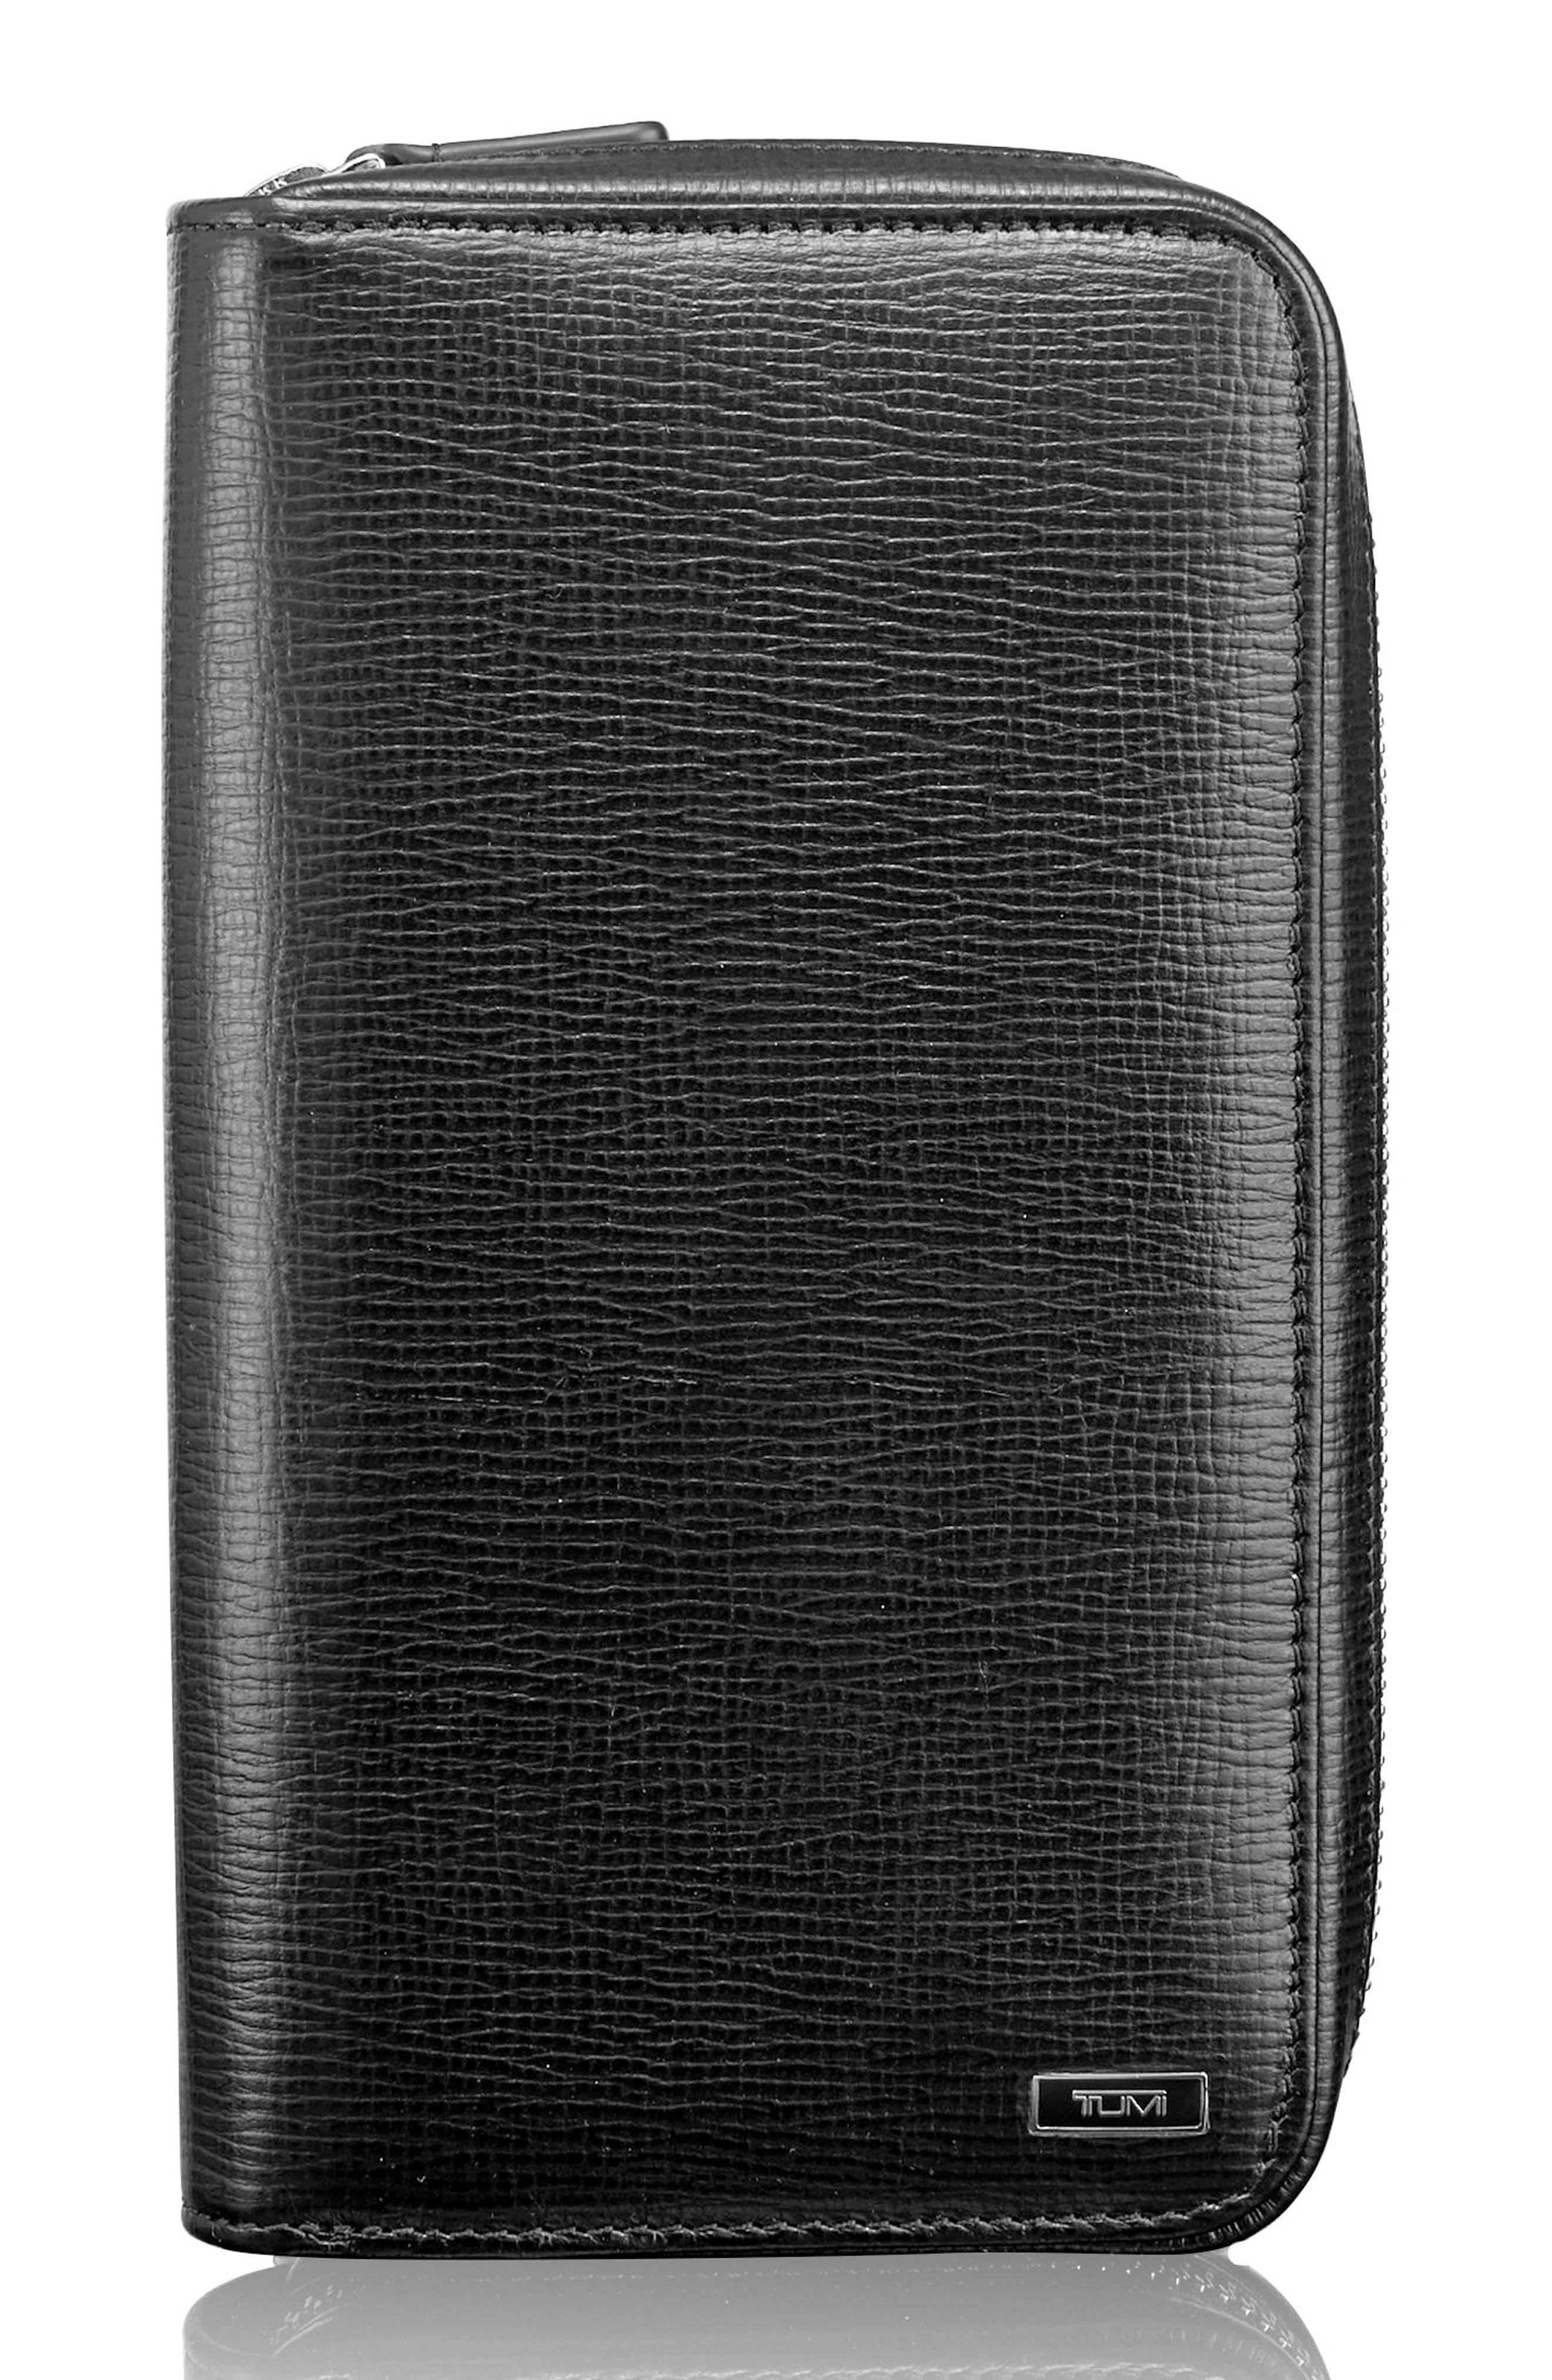 Tumi Zip-Around Leather Travel Wallet